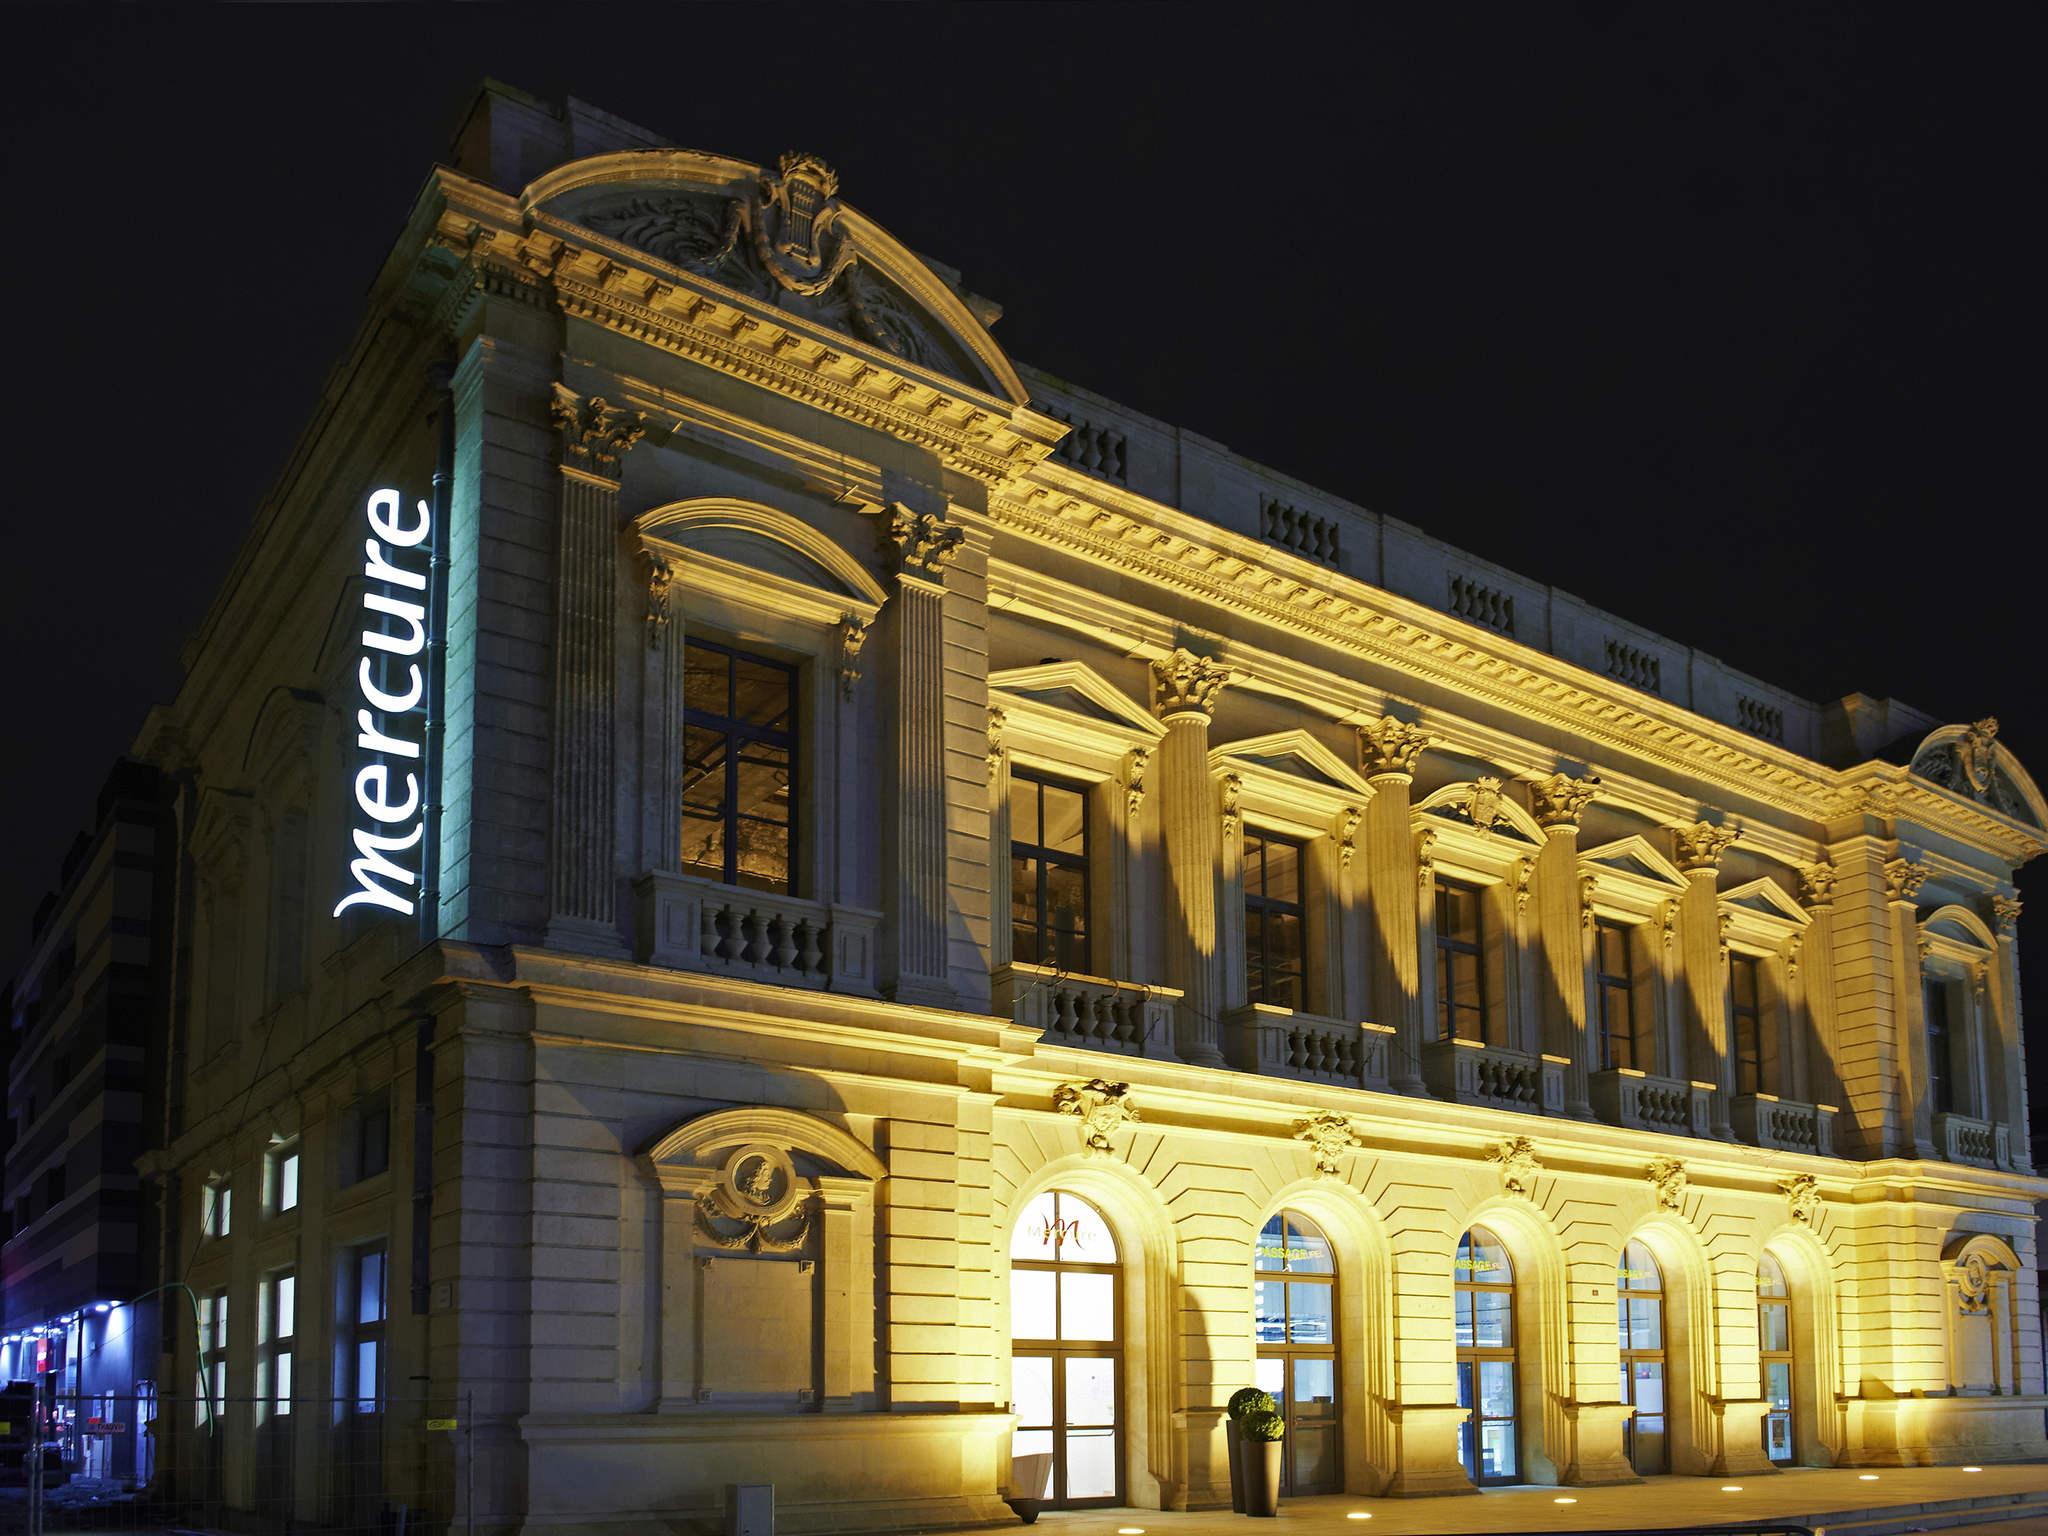 Hotel – Hotel Mercure Cholet Centro